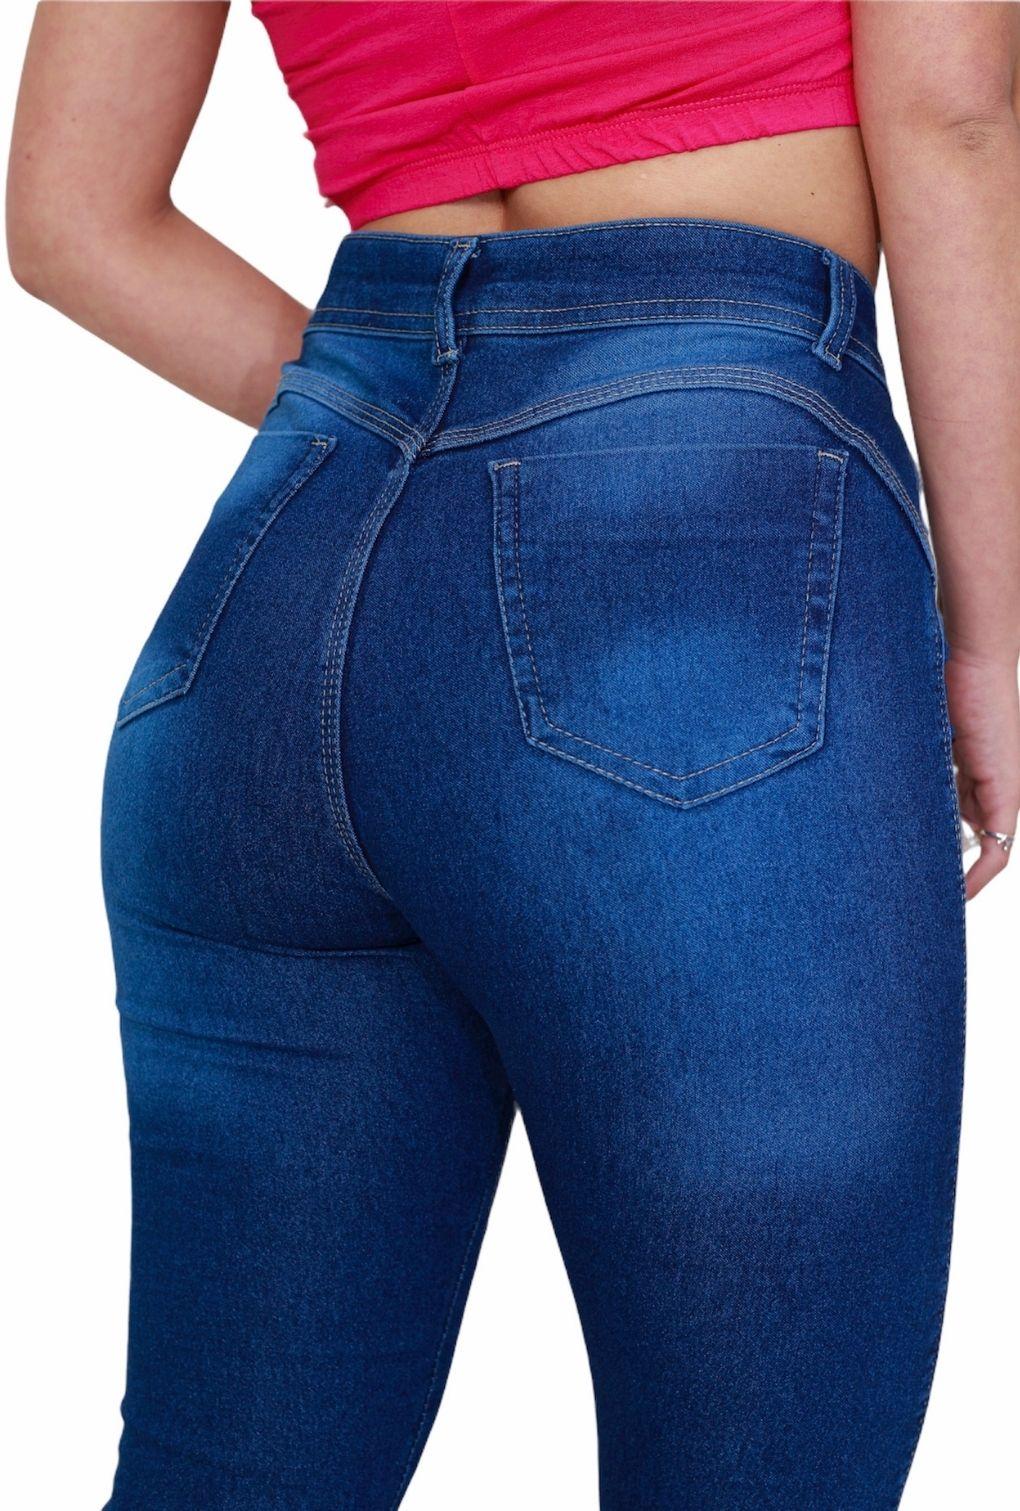 Calça Jeans Básica Cintura Média Feminina Levanta Bumbum  - ModaStore | Moda Feminina